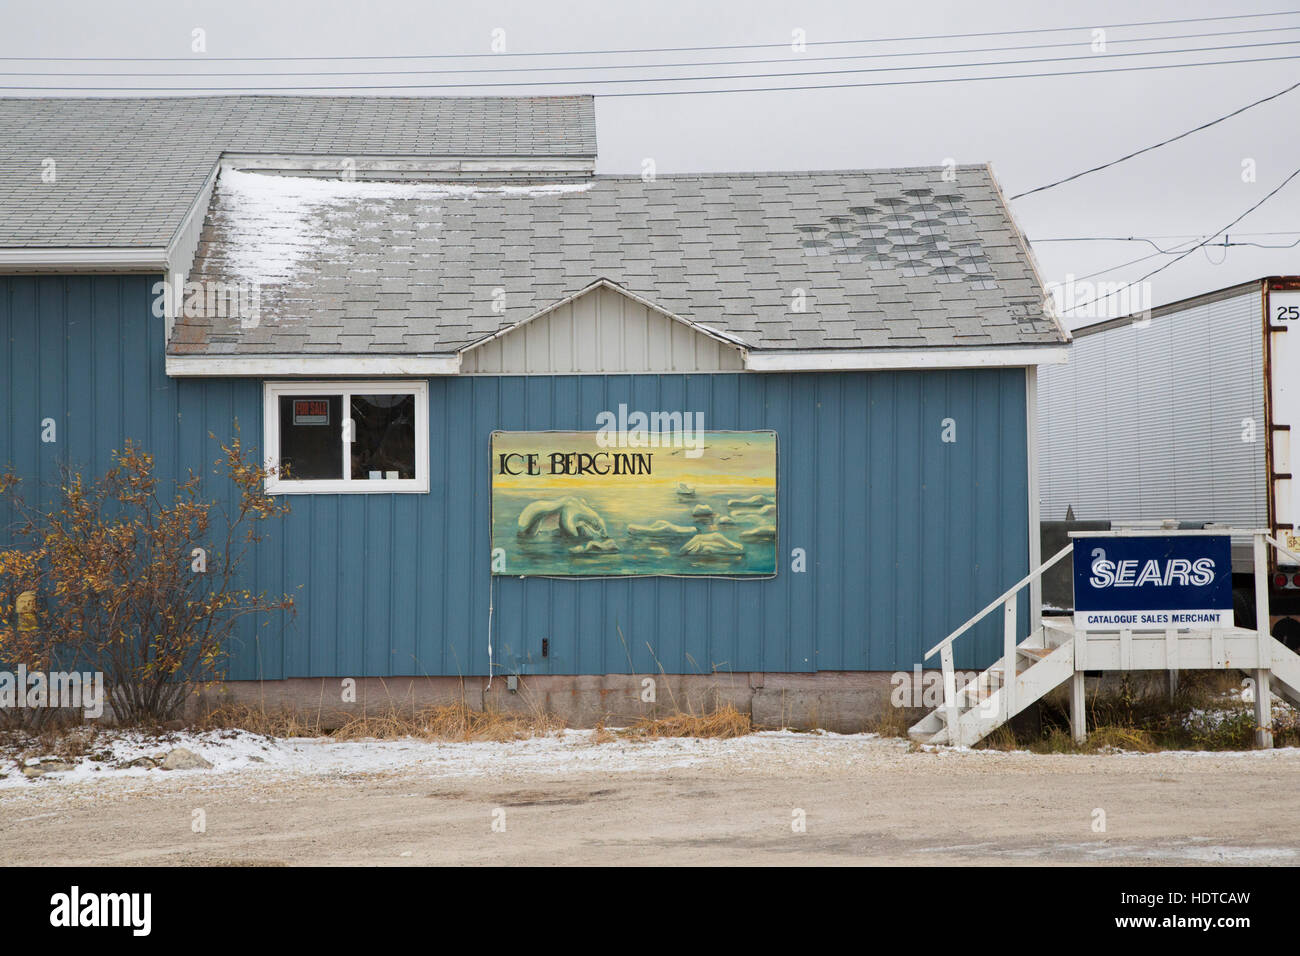 Entrance to the Ice Berg Inn at Churchill, Canada. - Stock Image